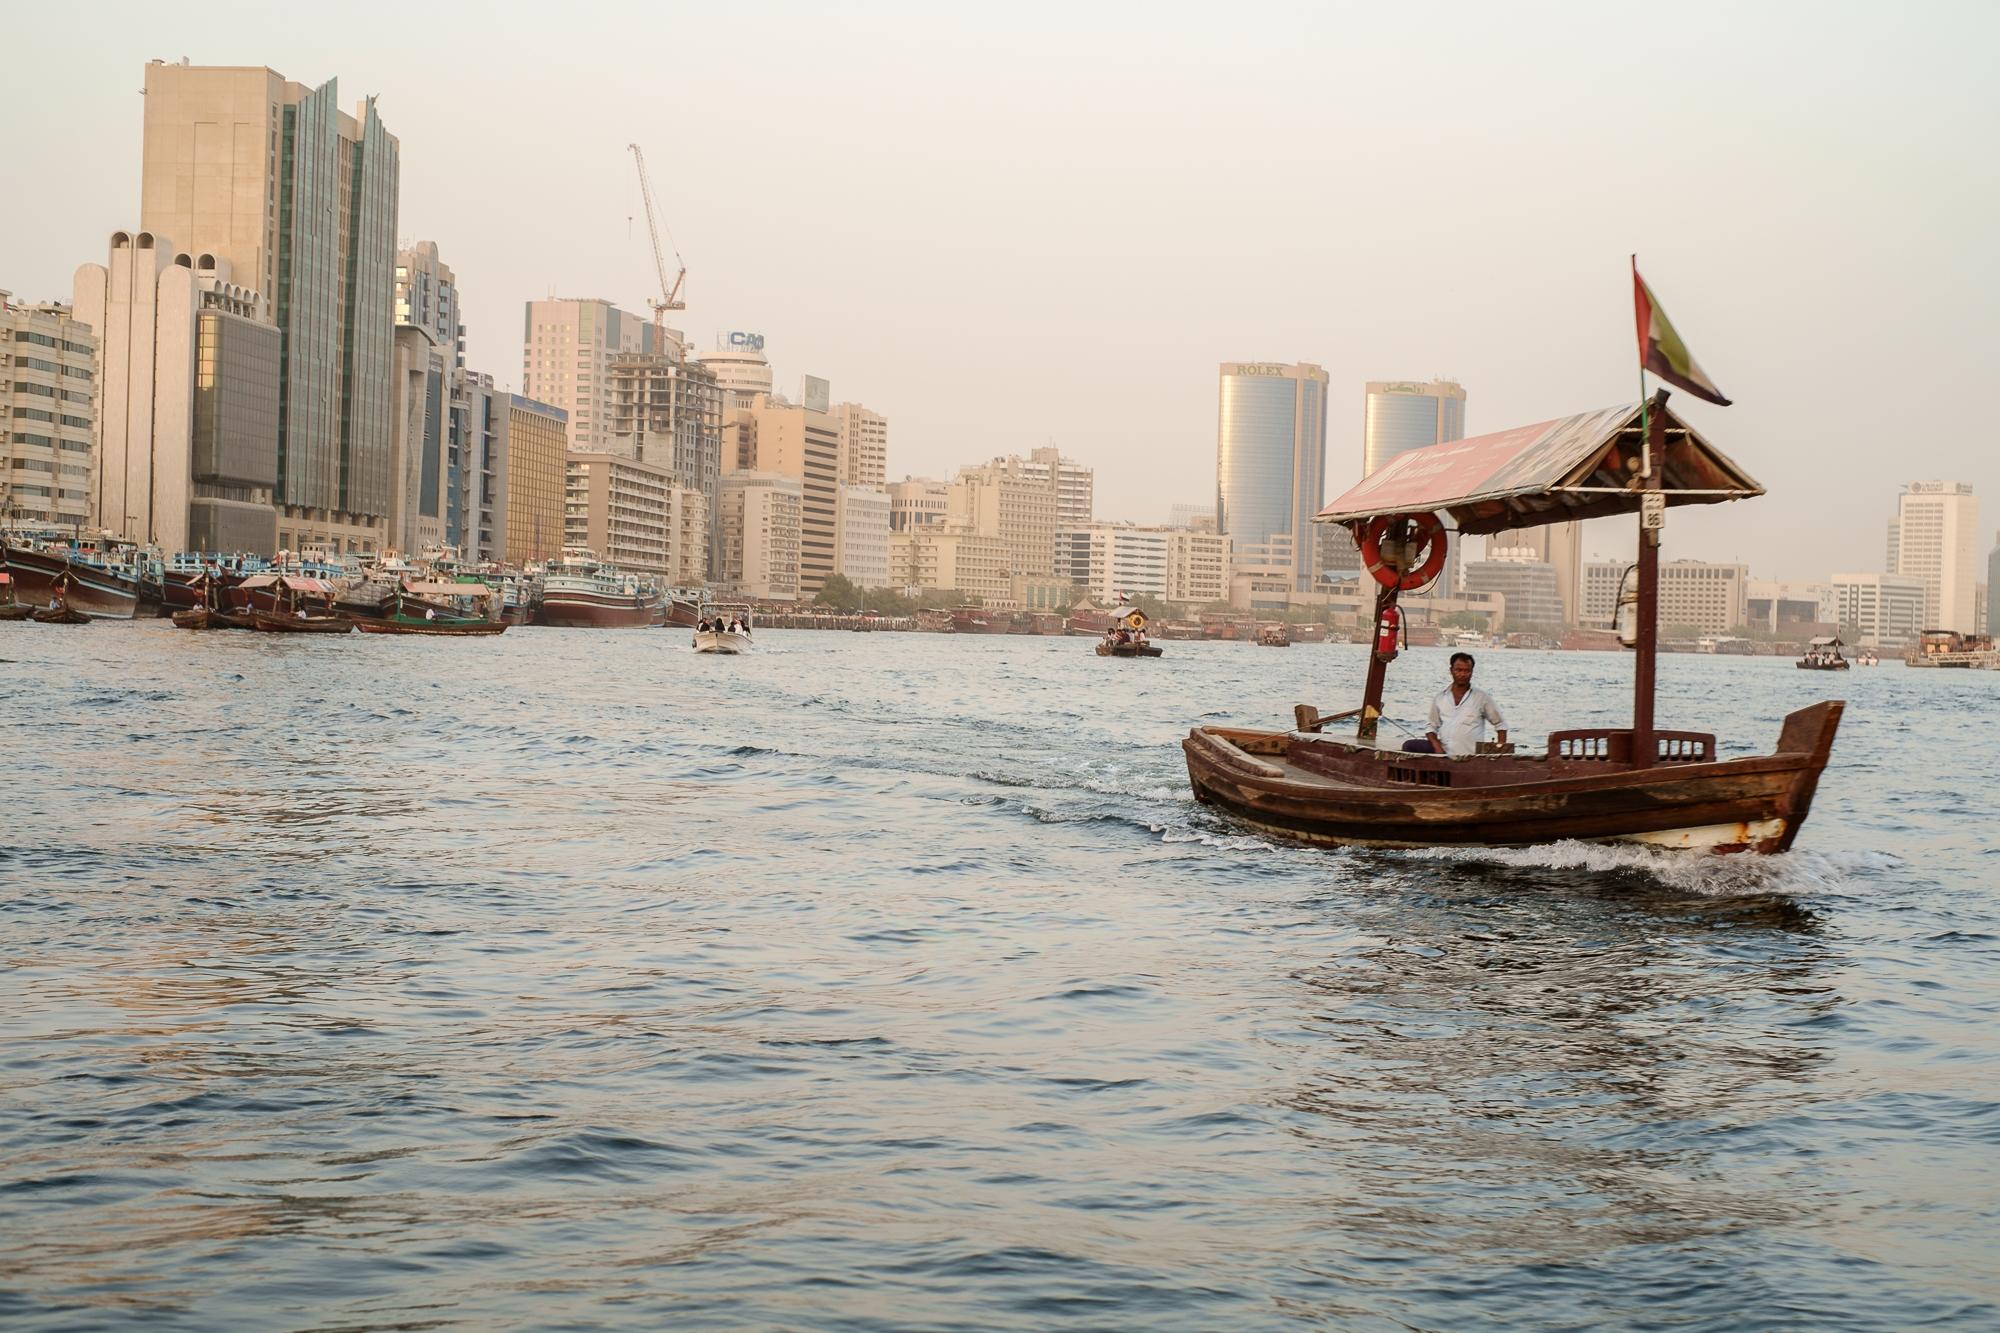 Dubai_08_15_0054.jpg